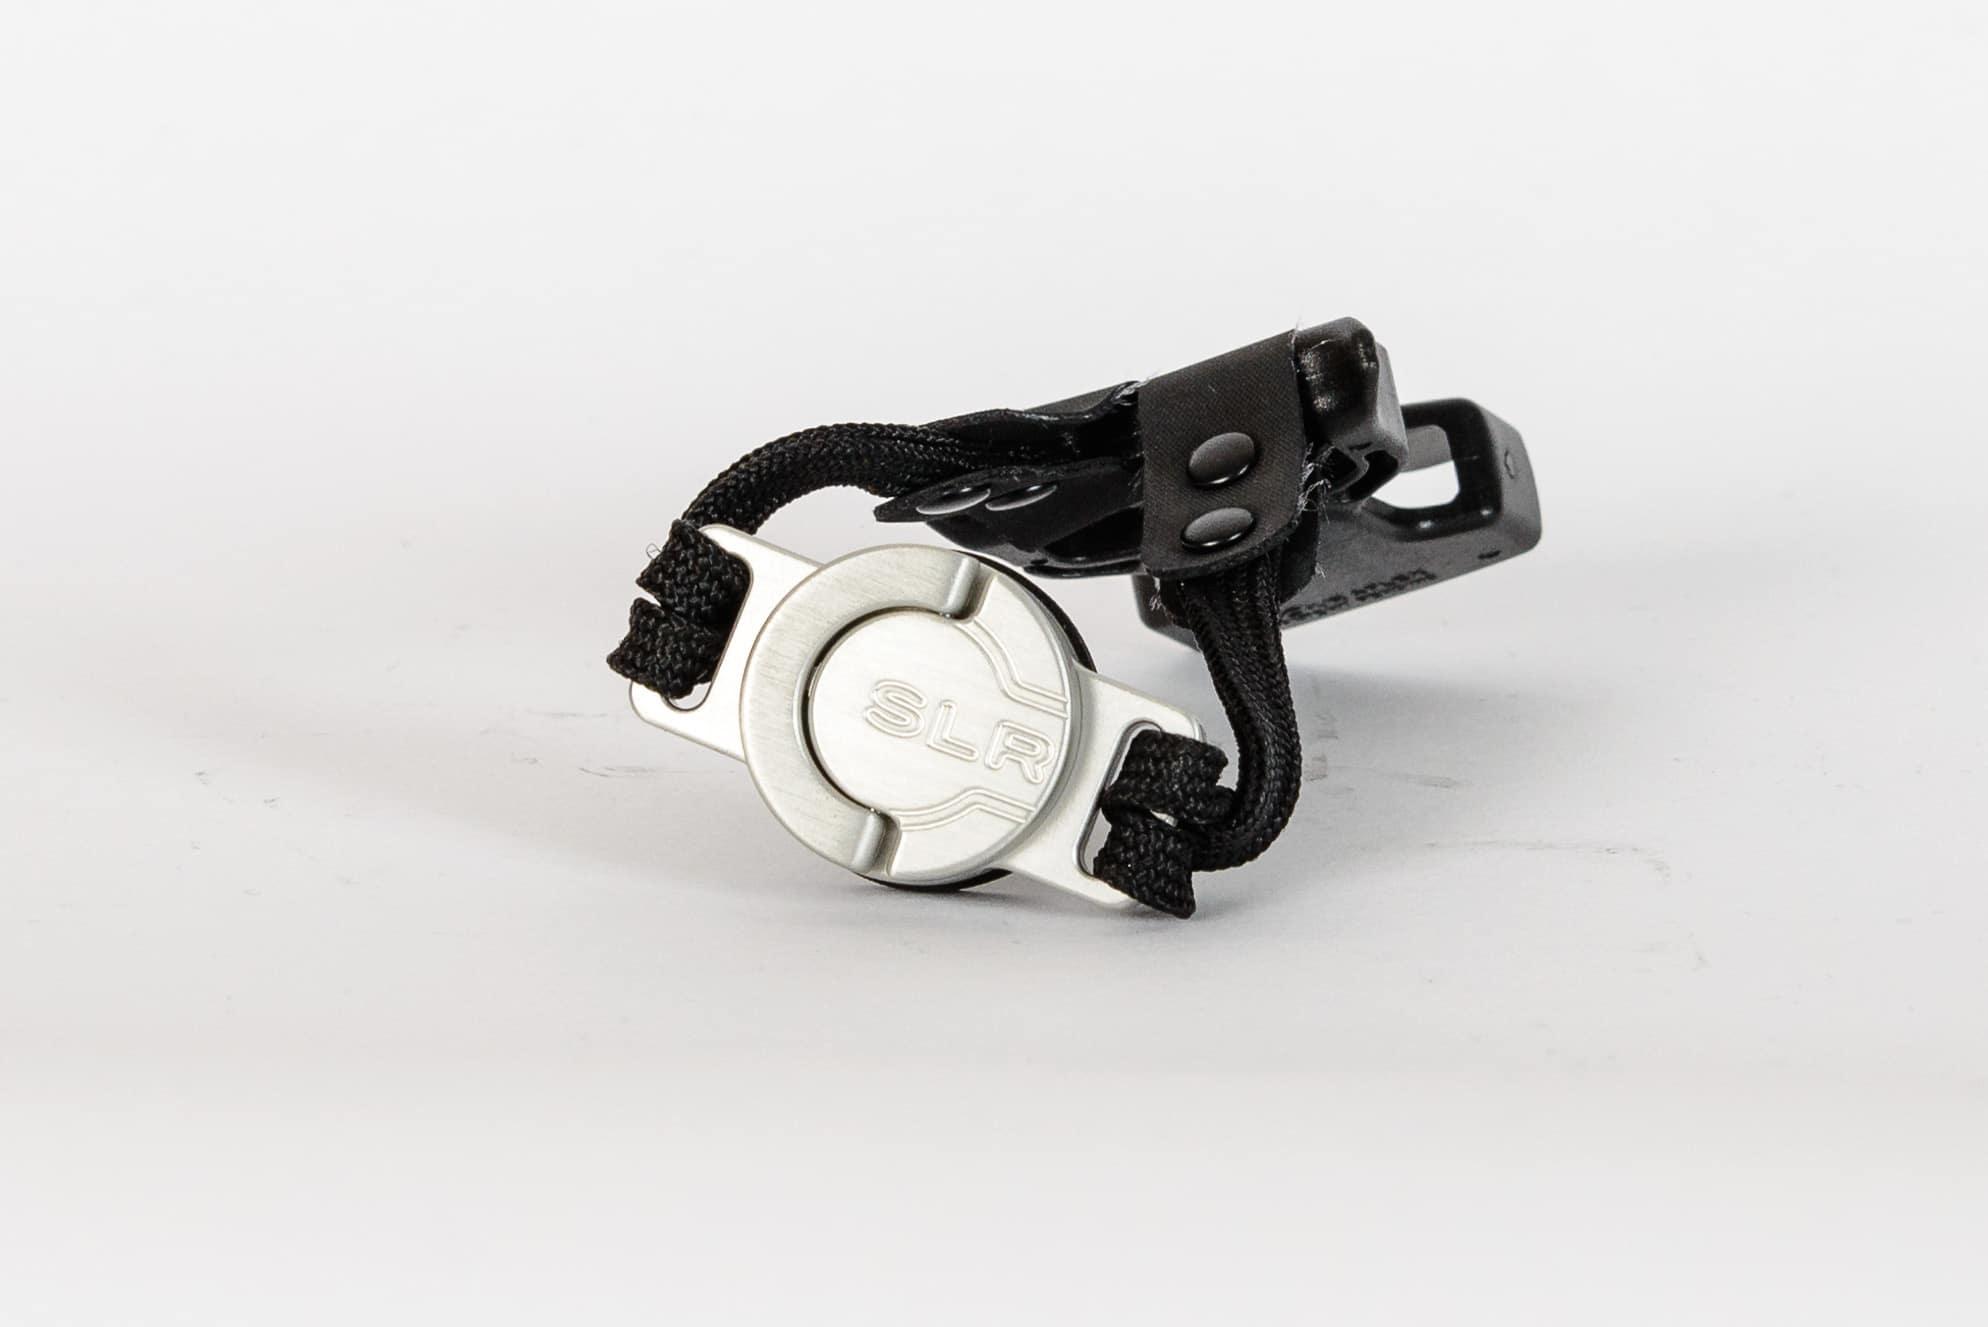 C-Loop von Custom SLR, (Foto copyright - Frank Weber - Berlin - fotologbuch.de)